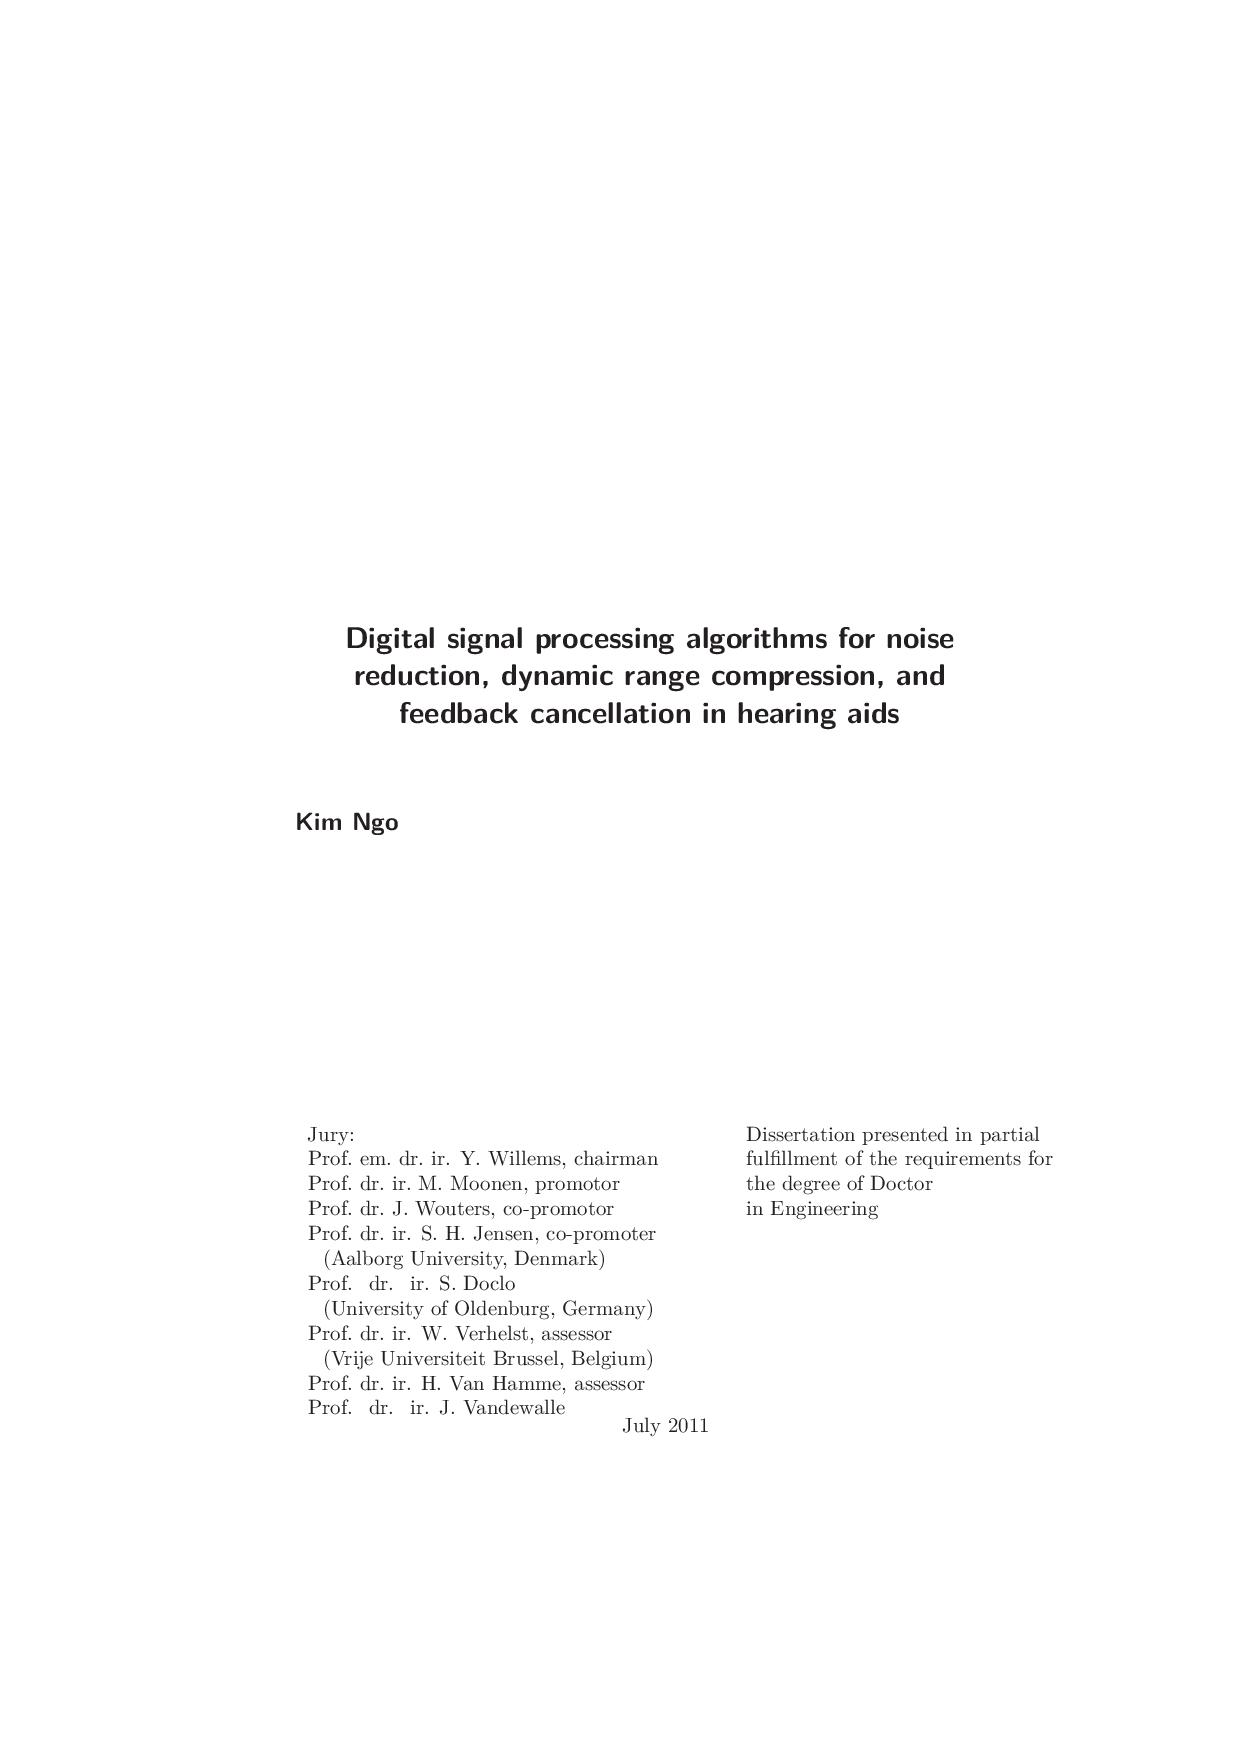 Digital signal processing algorithms for noise reduction